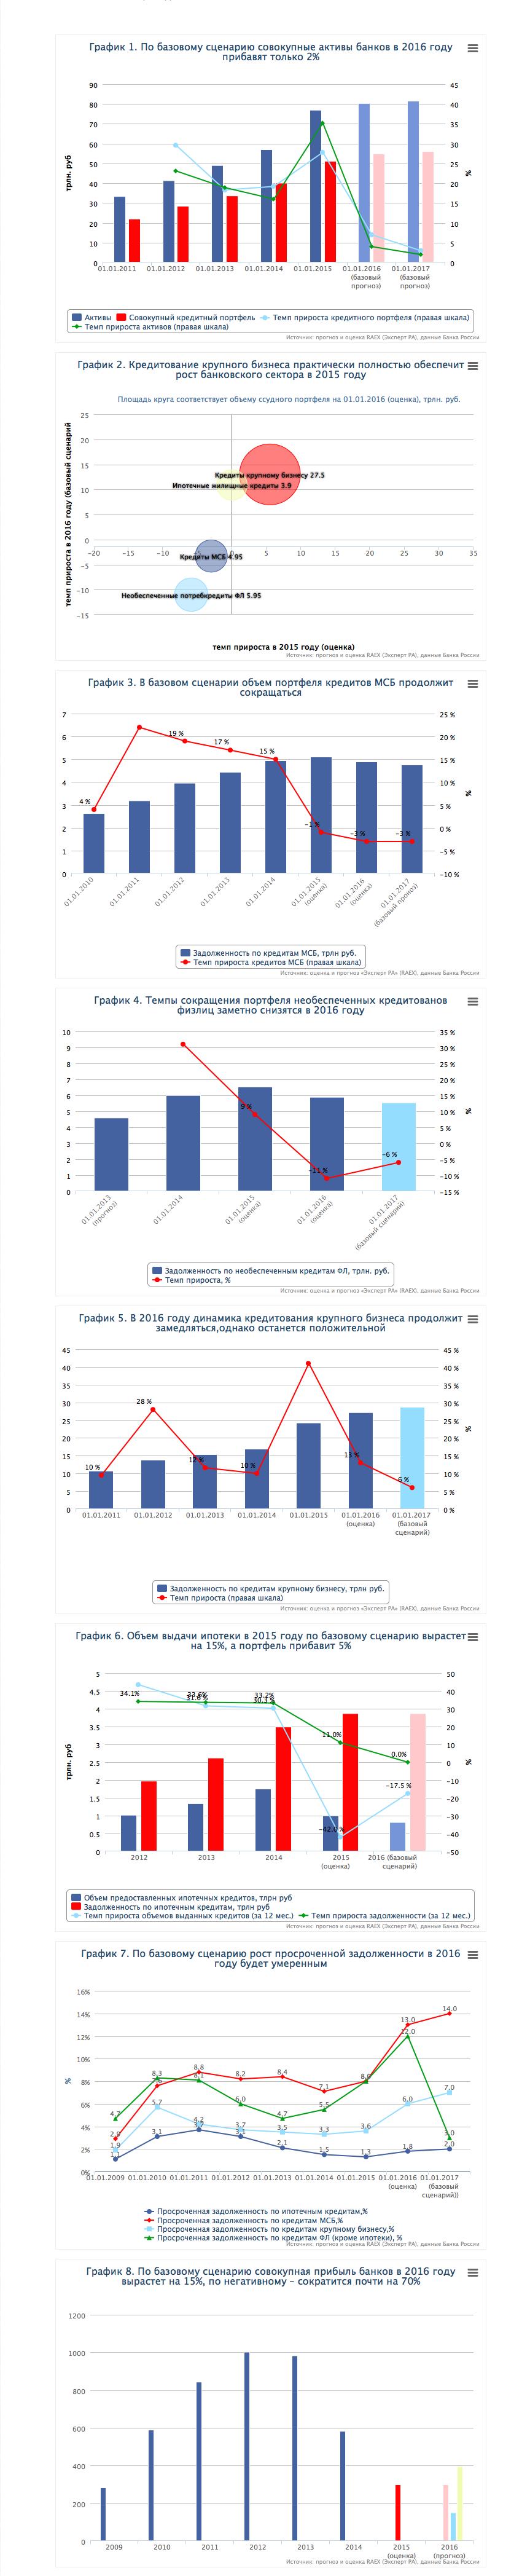 Сценарий развития банковского сектор